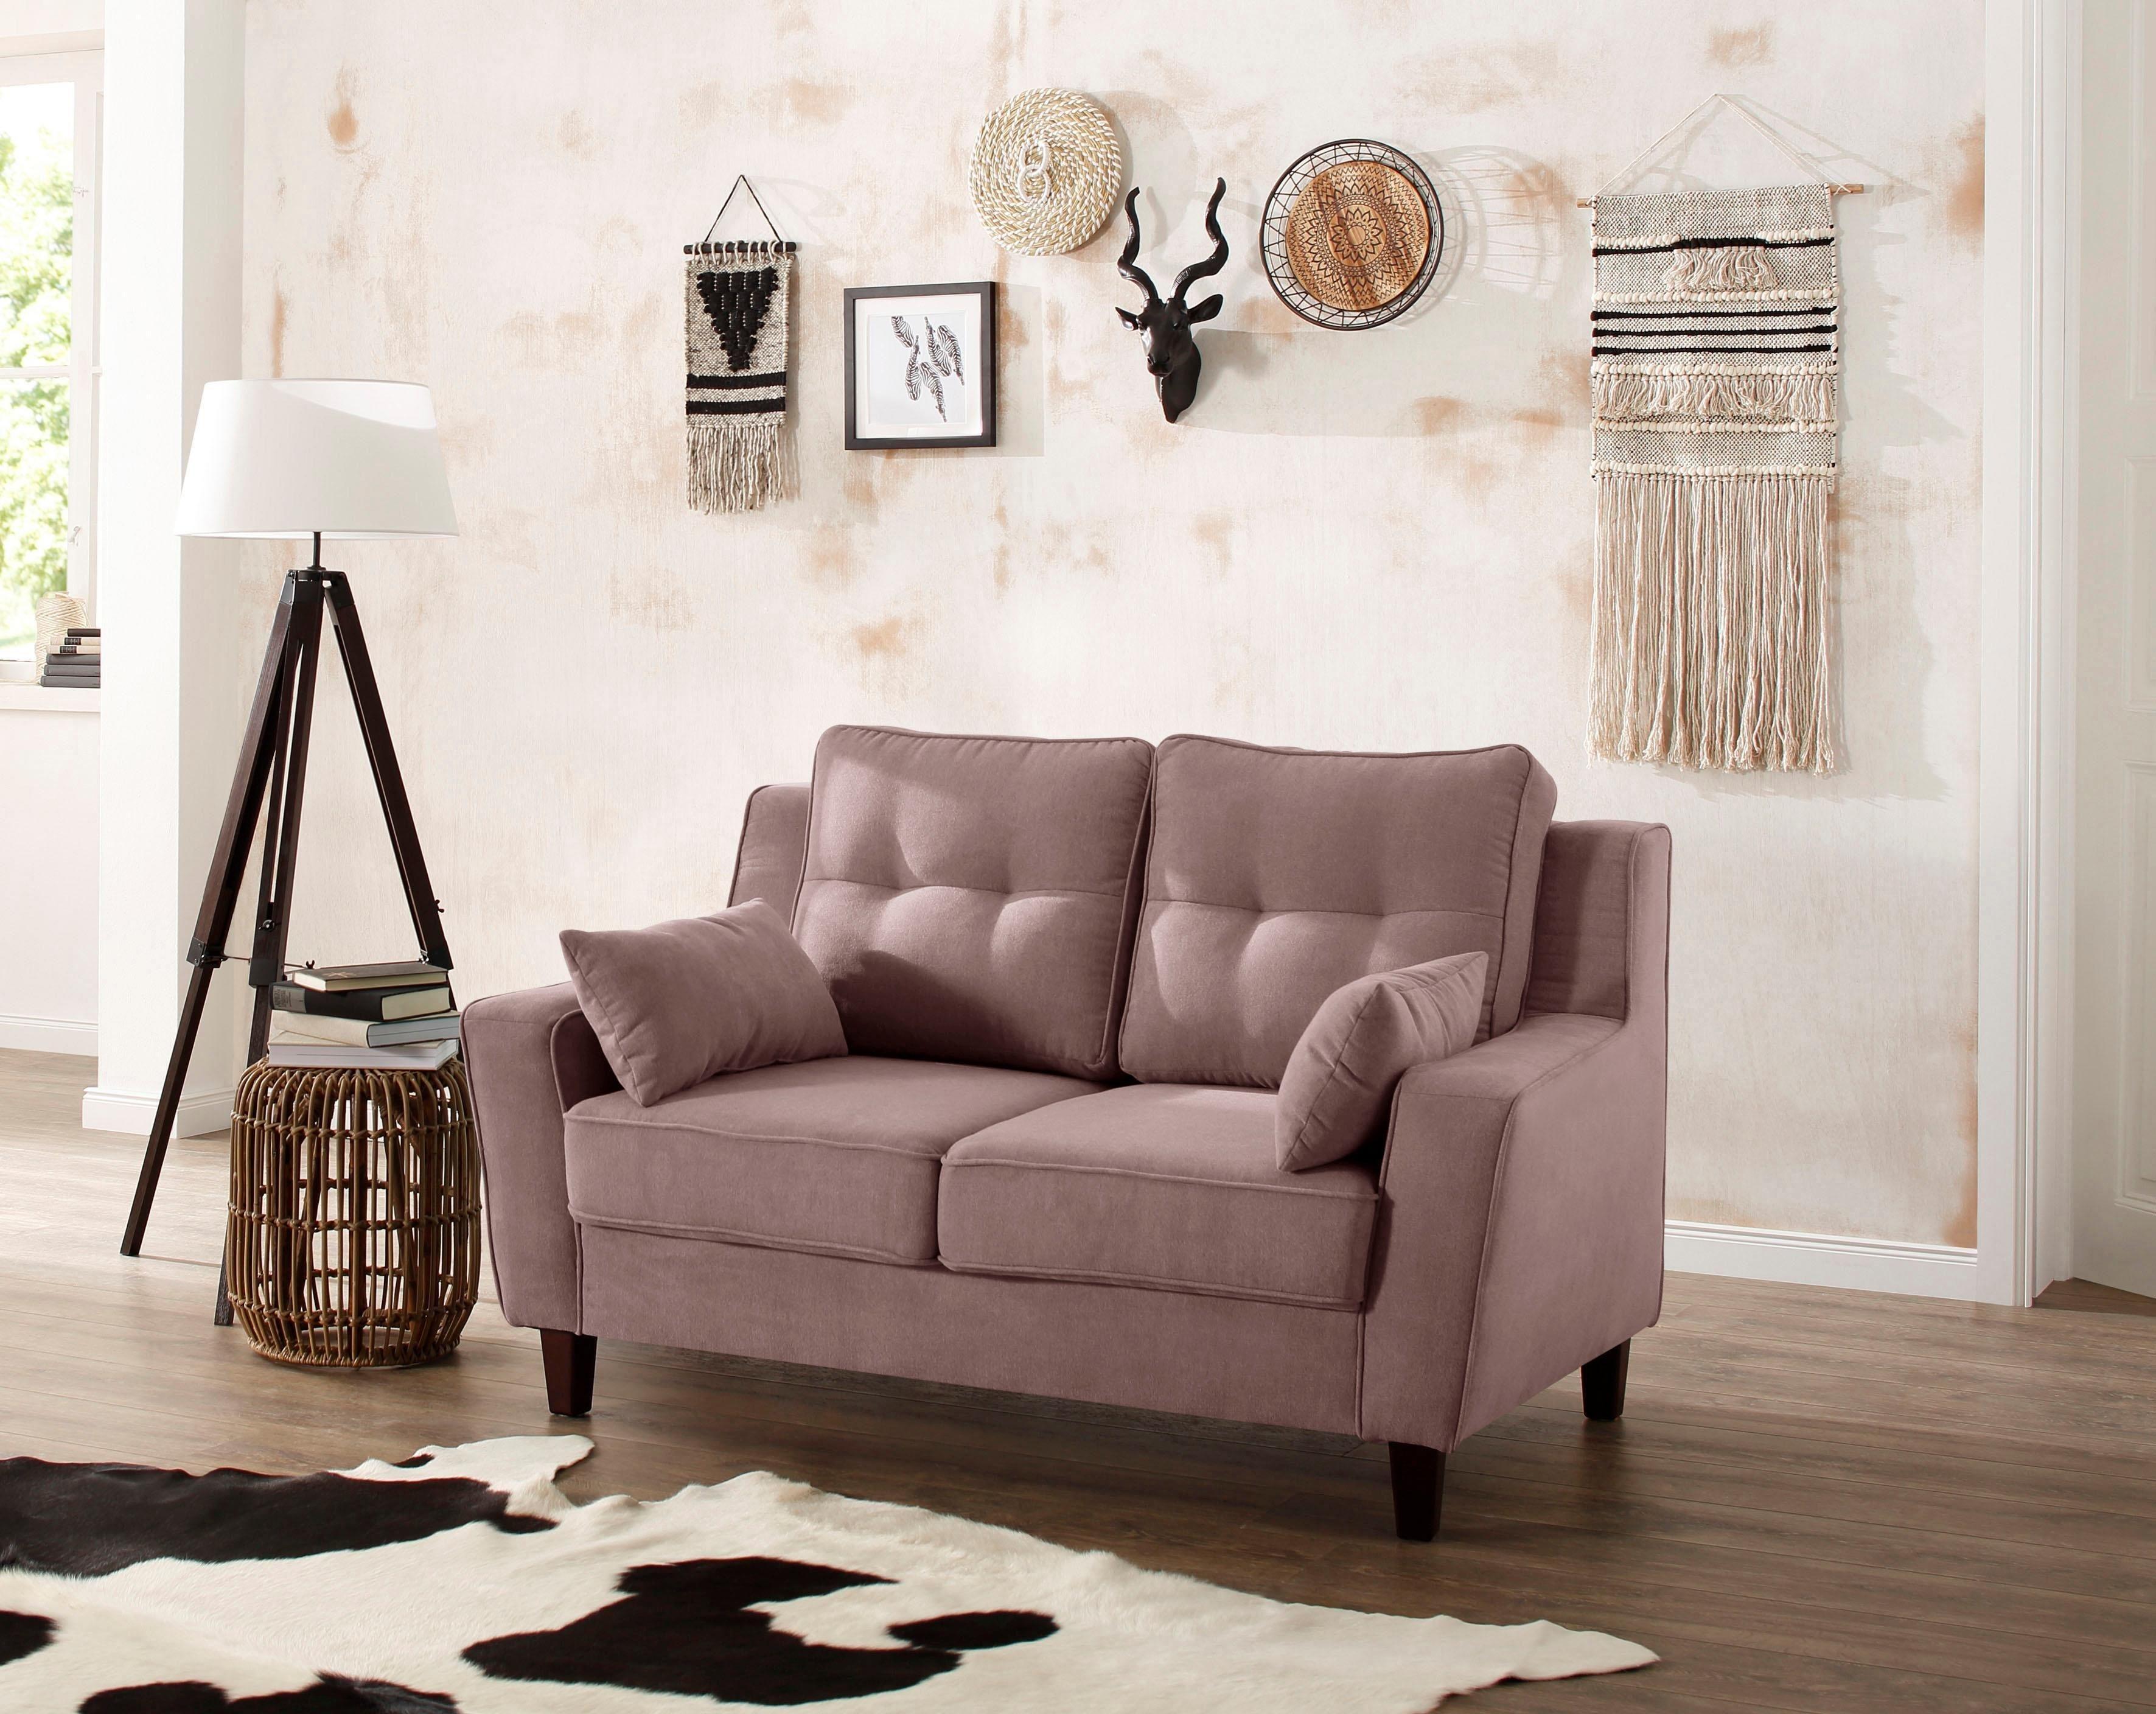 Home Affaire 2 Sitzer Dione In 2020 Sofa Leder Braun Rosa Sofa Landhaus Mobel